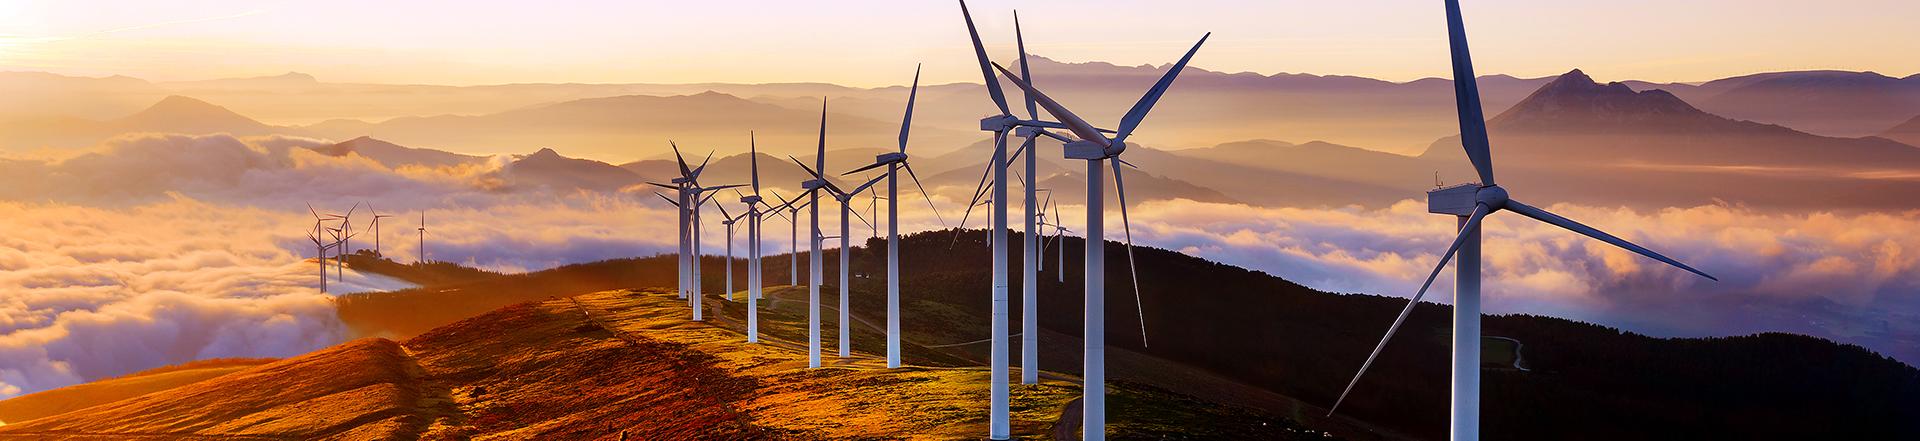 wind-turbines-1920×440-cb-large-2019-04-09